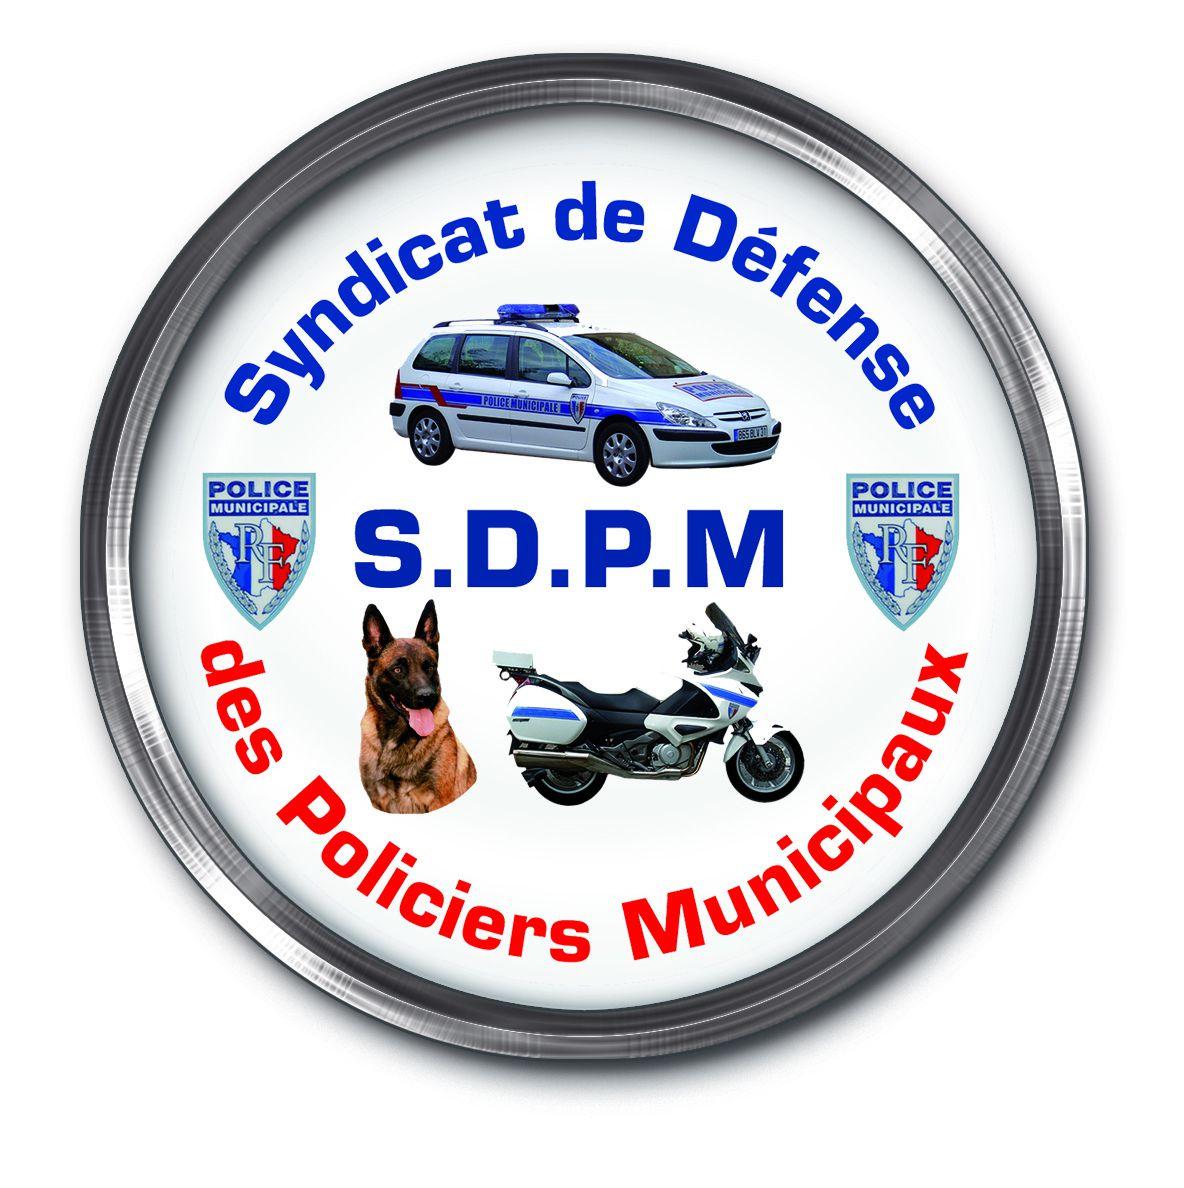 (c) Sdpm.net